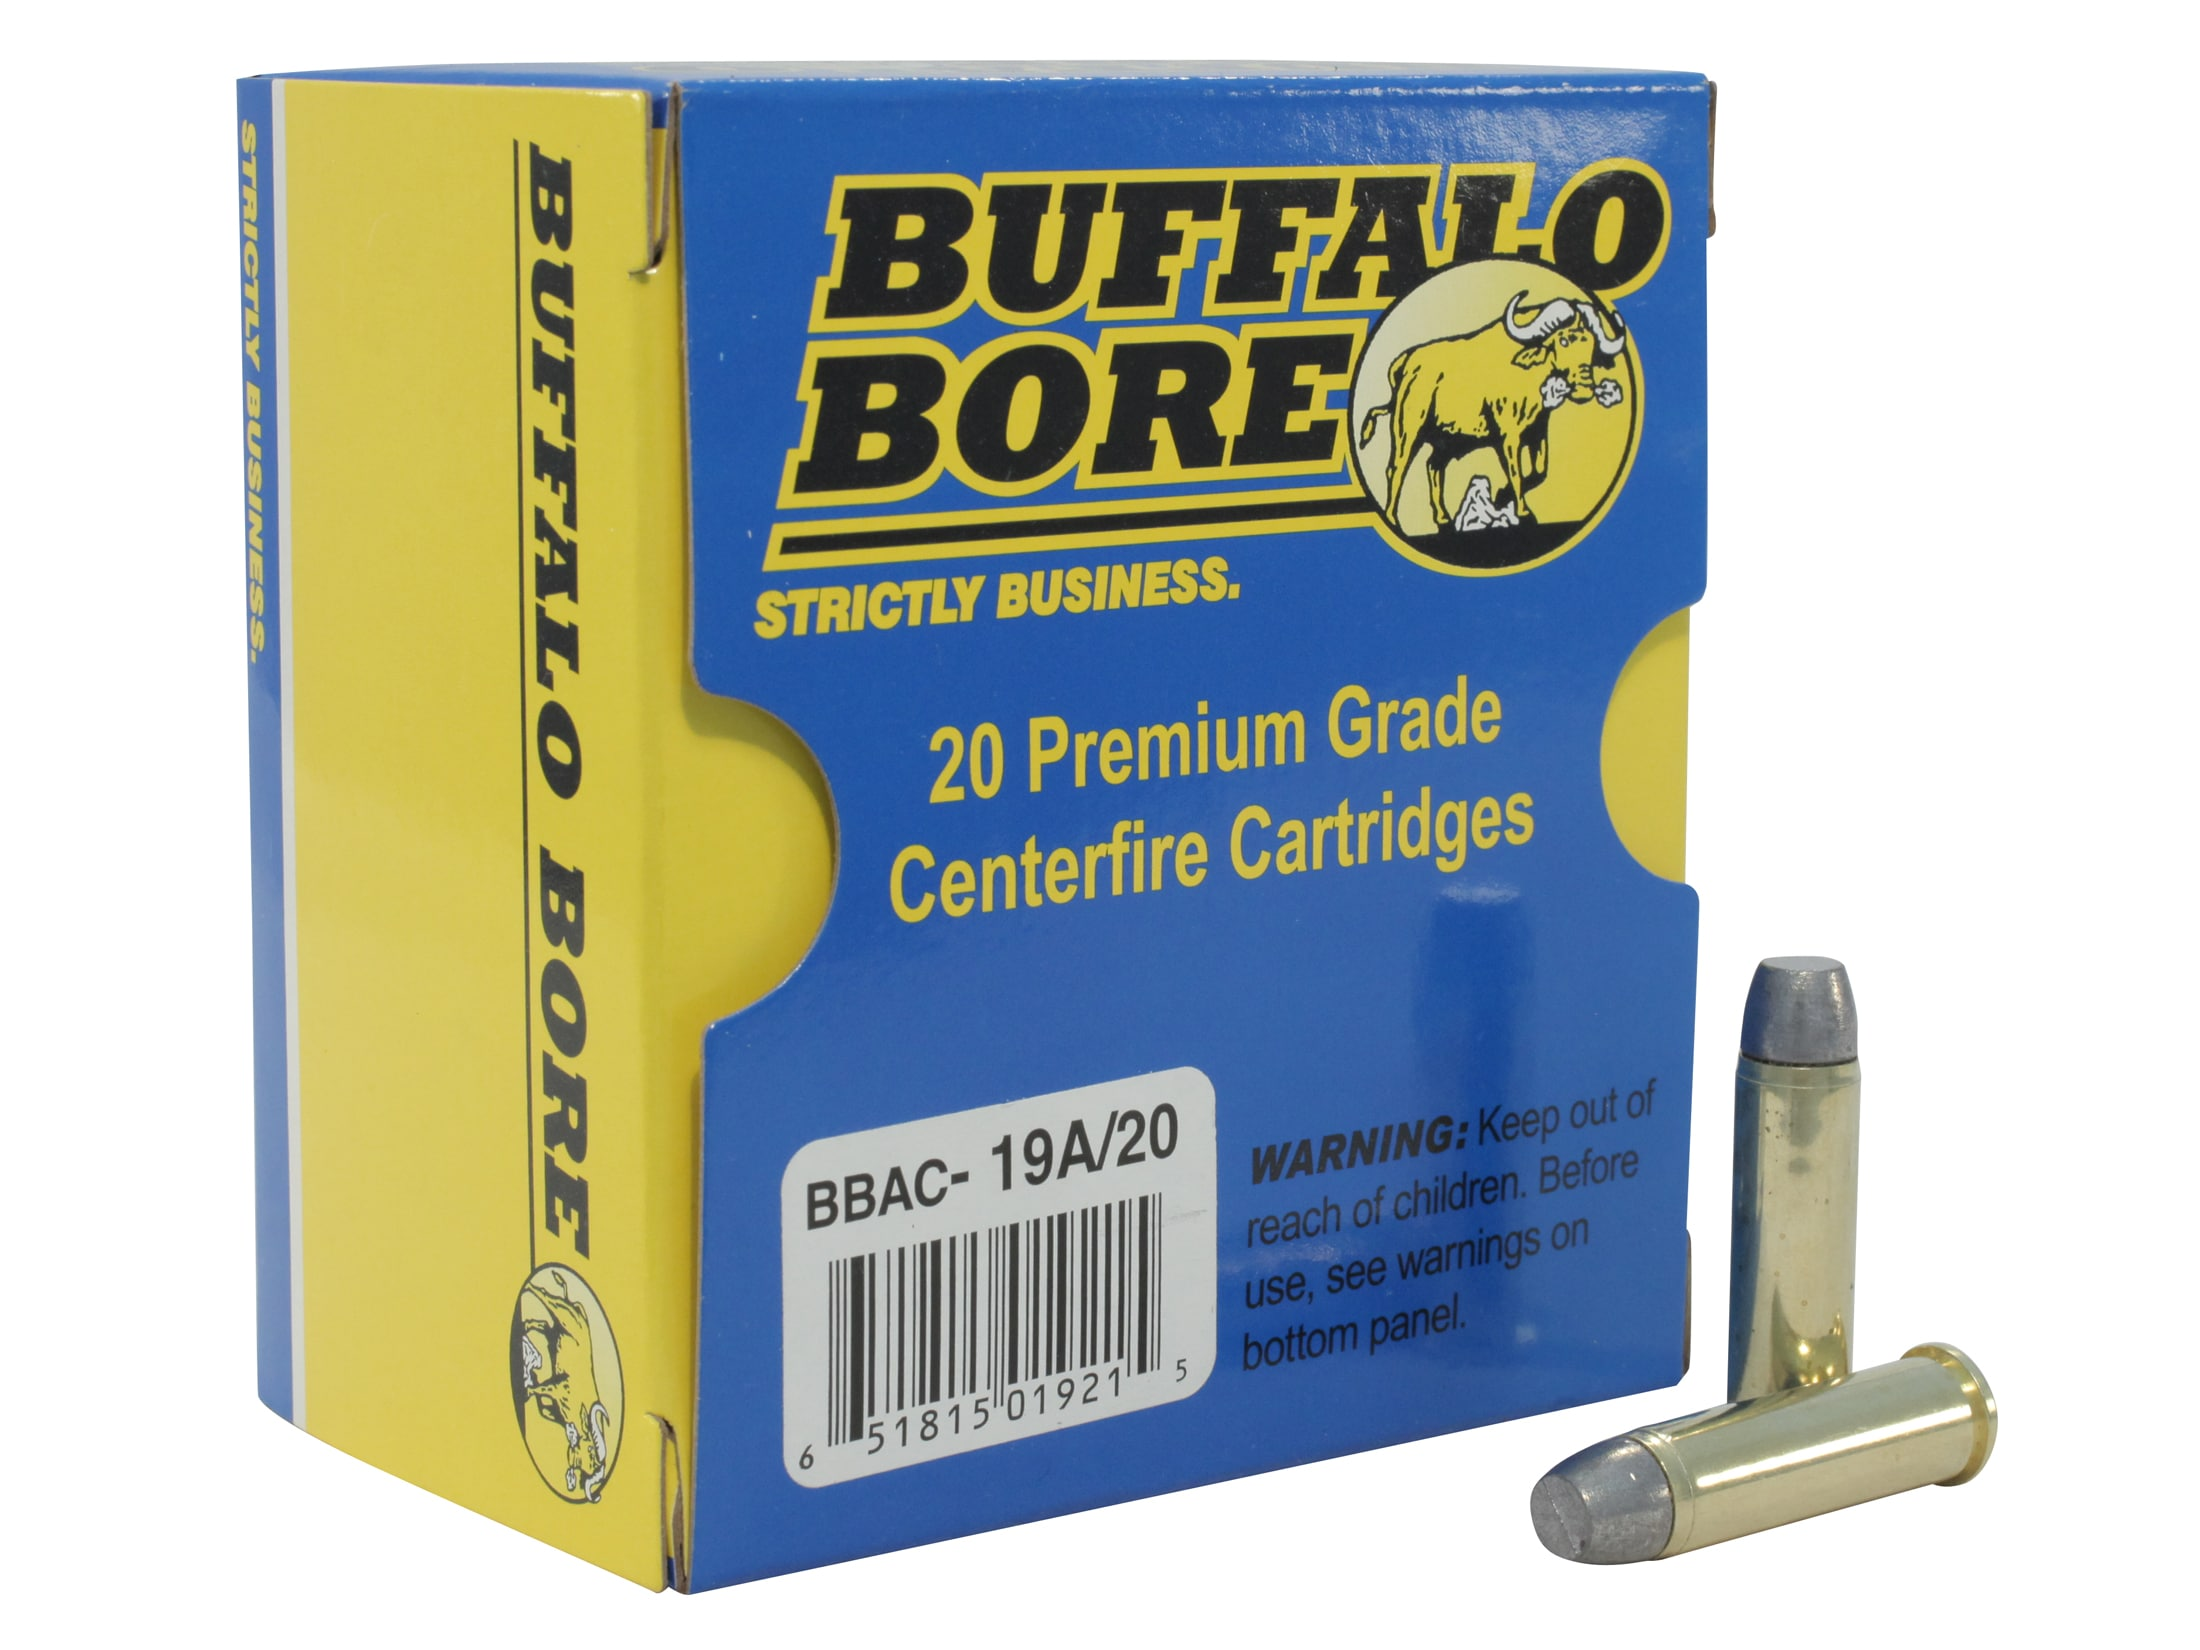 Buffalo Bore Ammo Outdoorsman 357 Mag 180 Grain Lead Flat Nose Gas